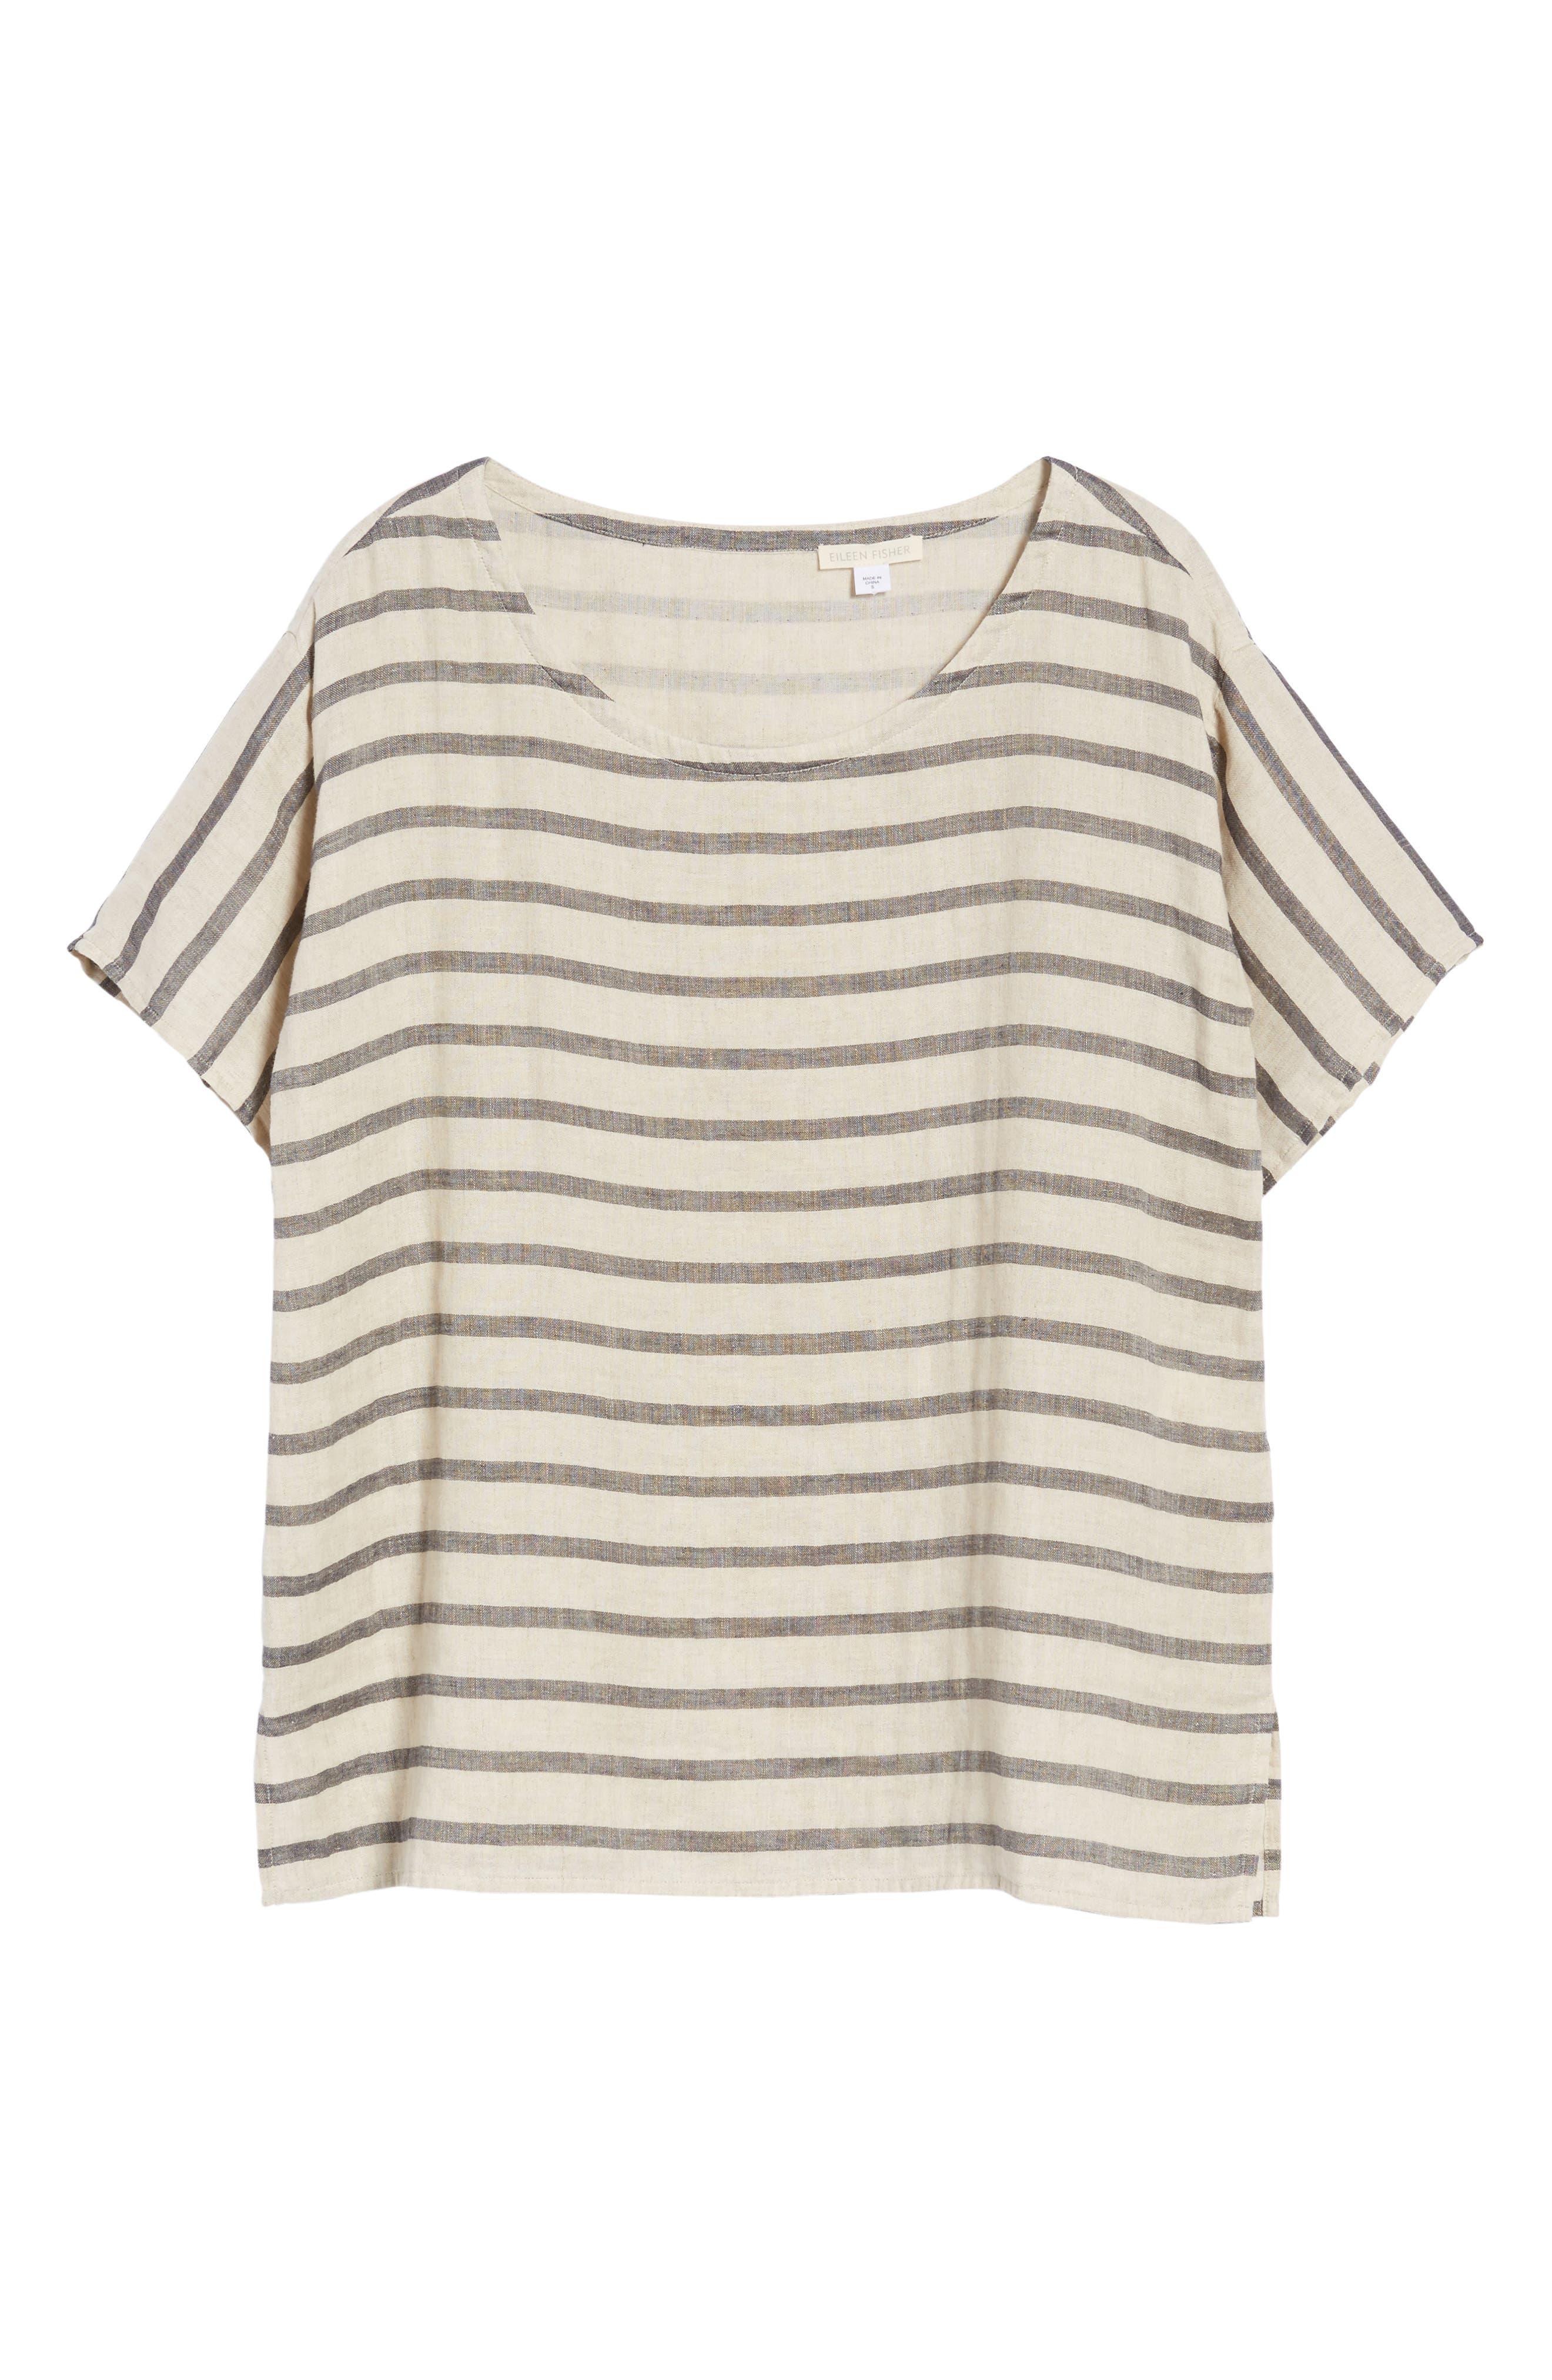 Stripe Linen & Organic Cotton Top,                             Alternate thumbnail 7, color,                             257